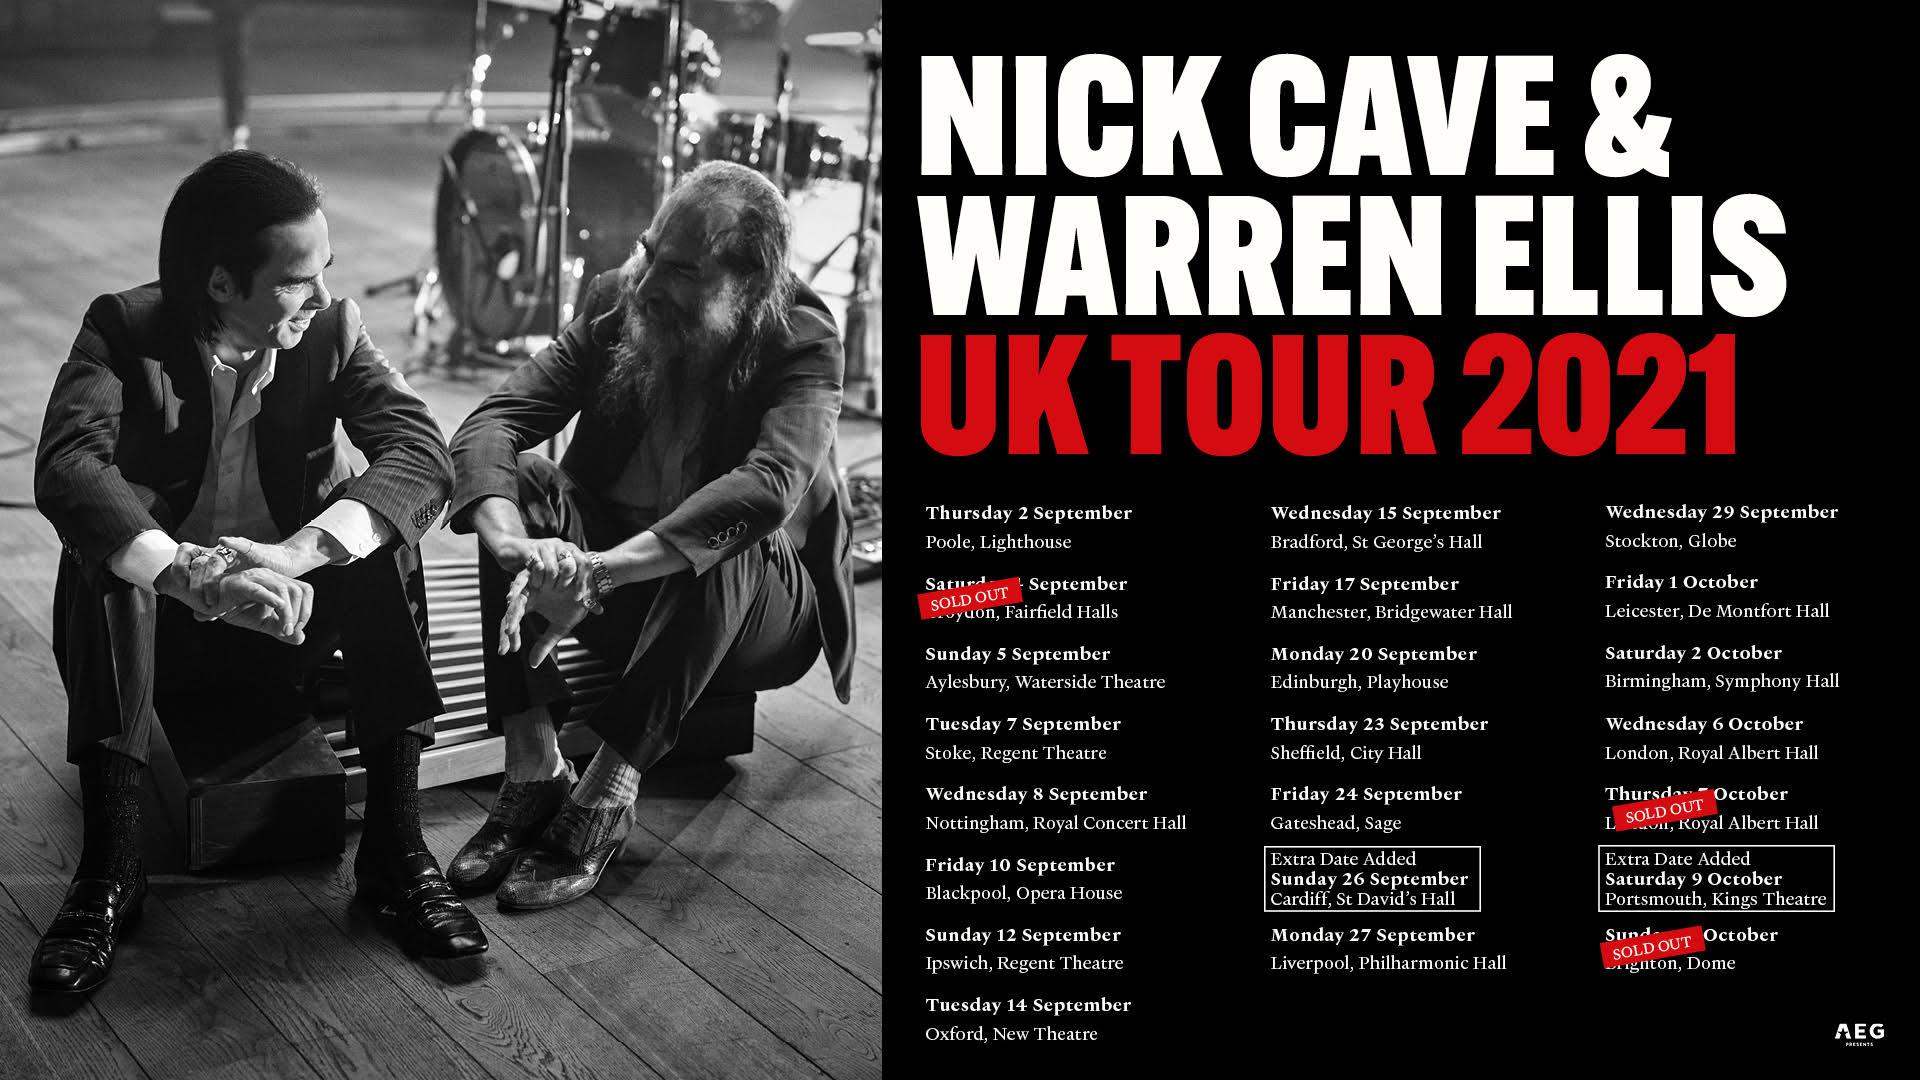 Nick Cave and Warren Ellis UK tour, 2021